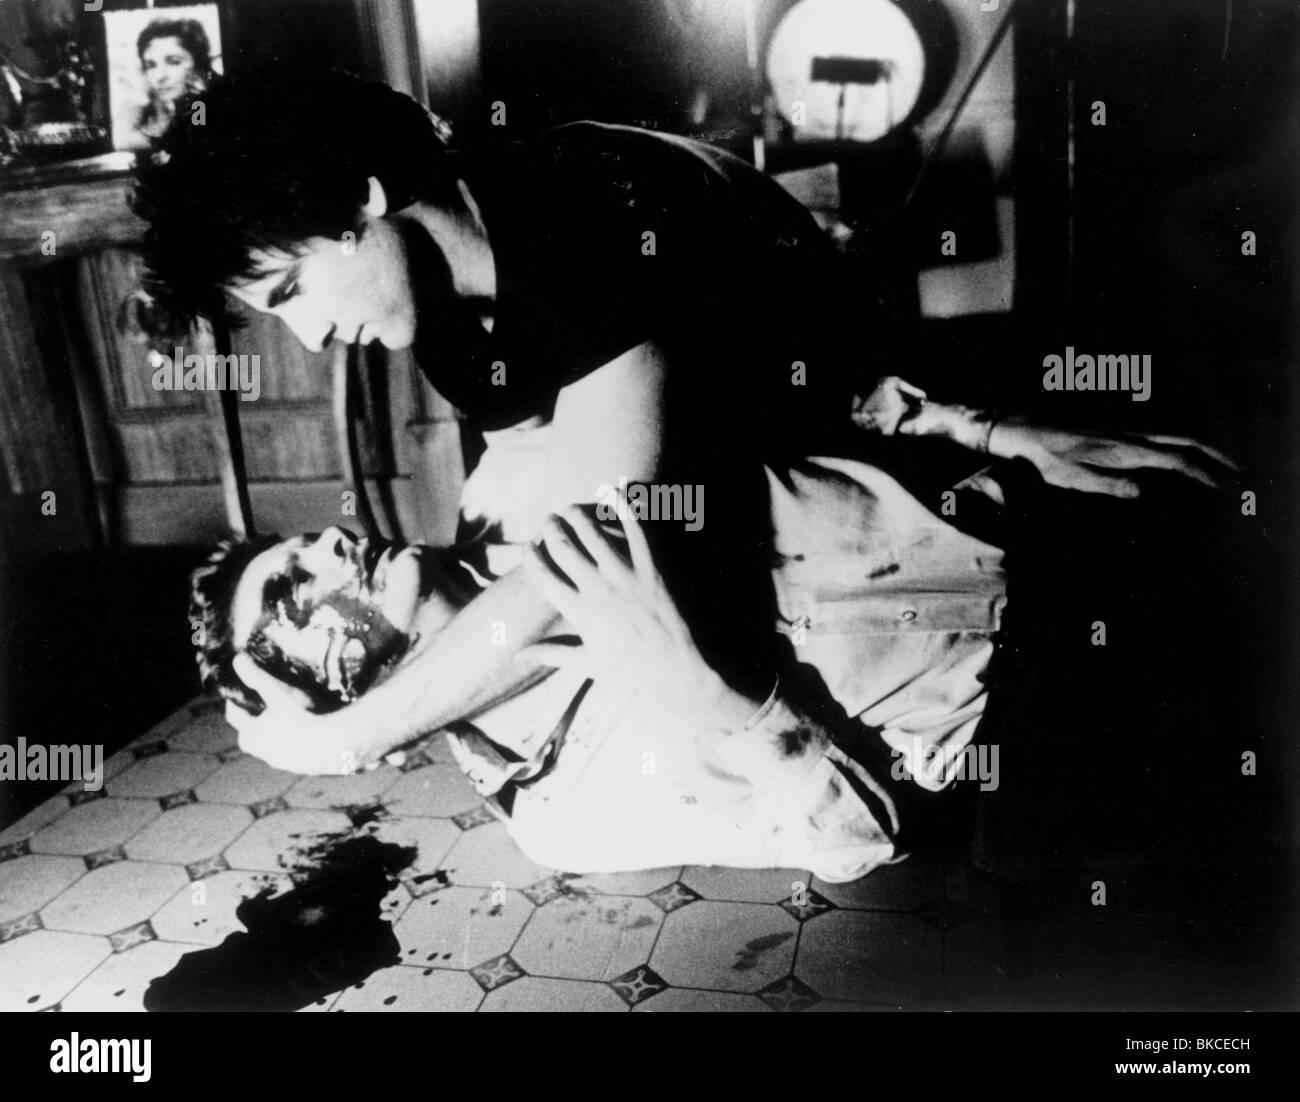 APARTMENT ZERO (1988) HART BOCHNER, COLIN FIRTH APZ 001P